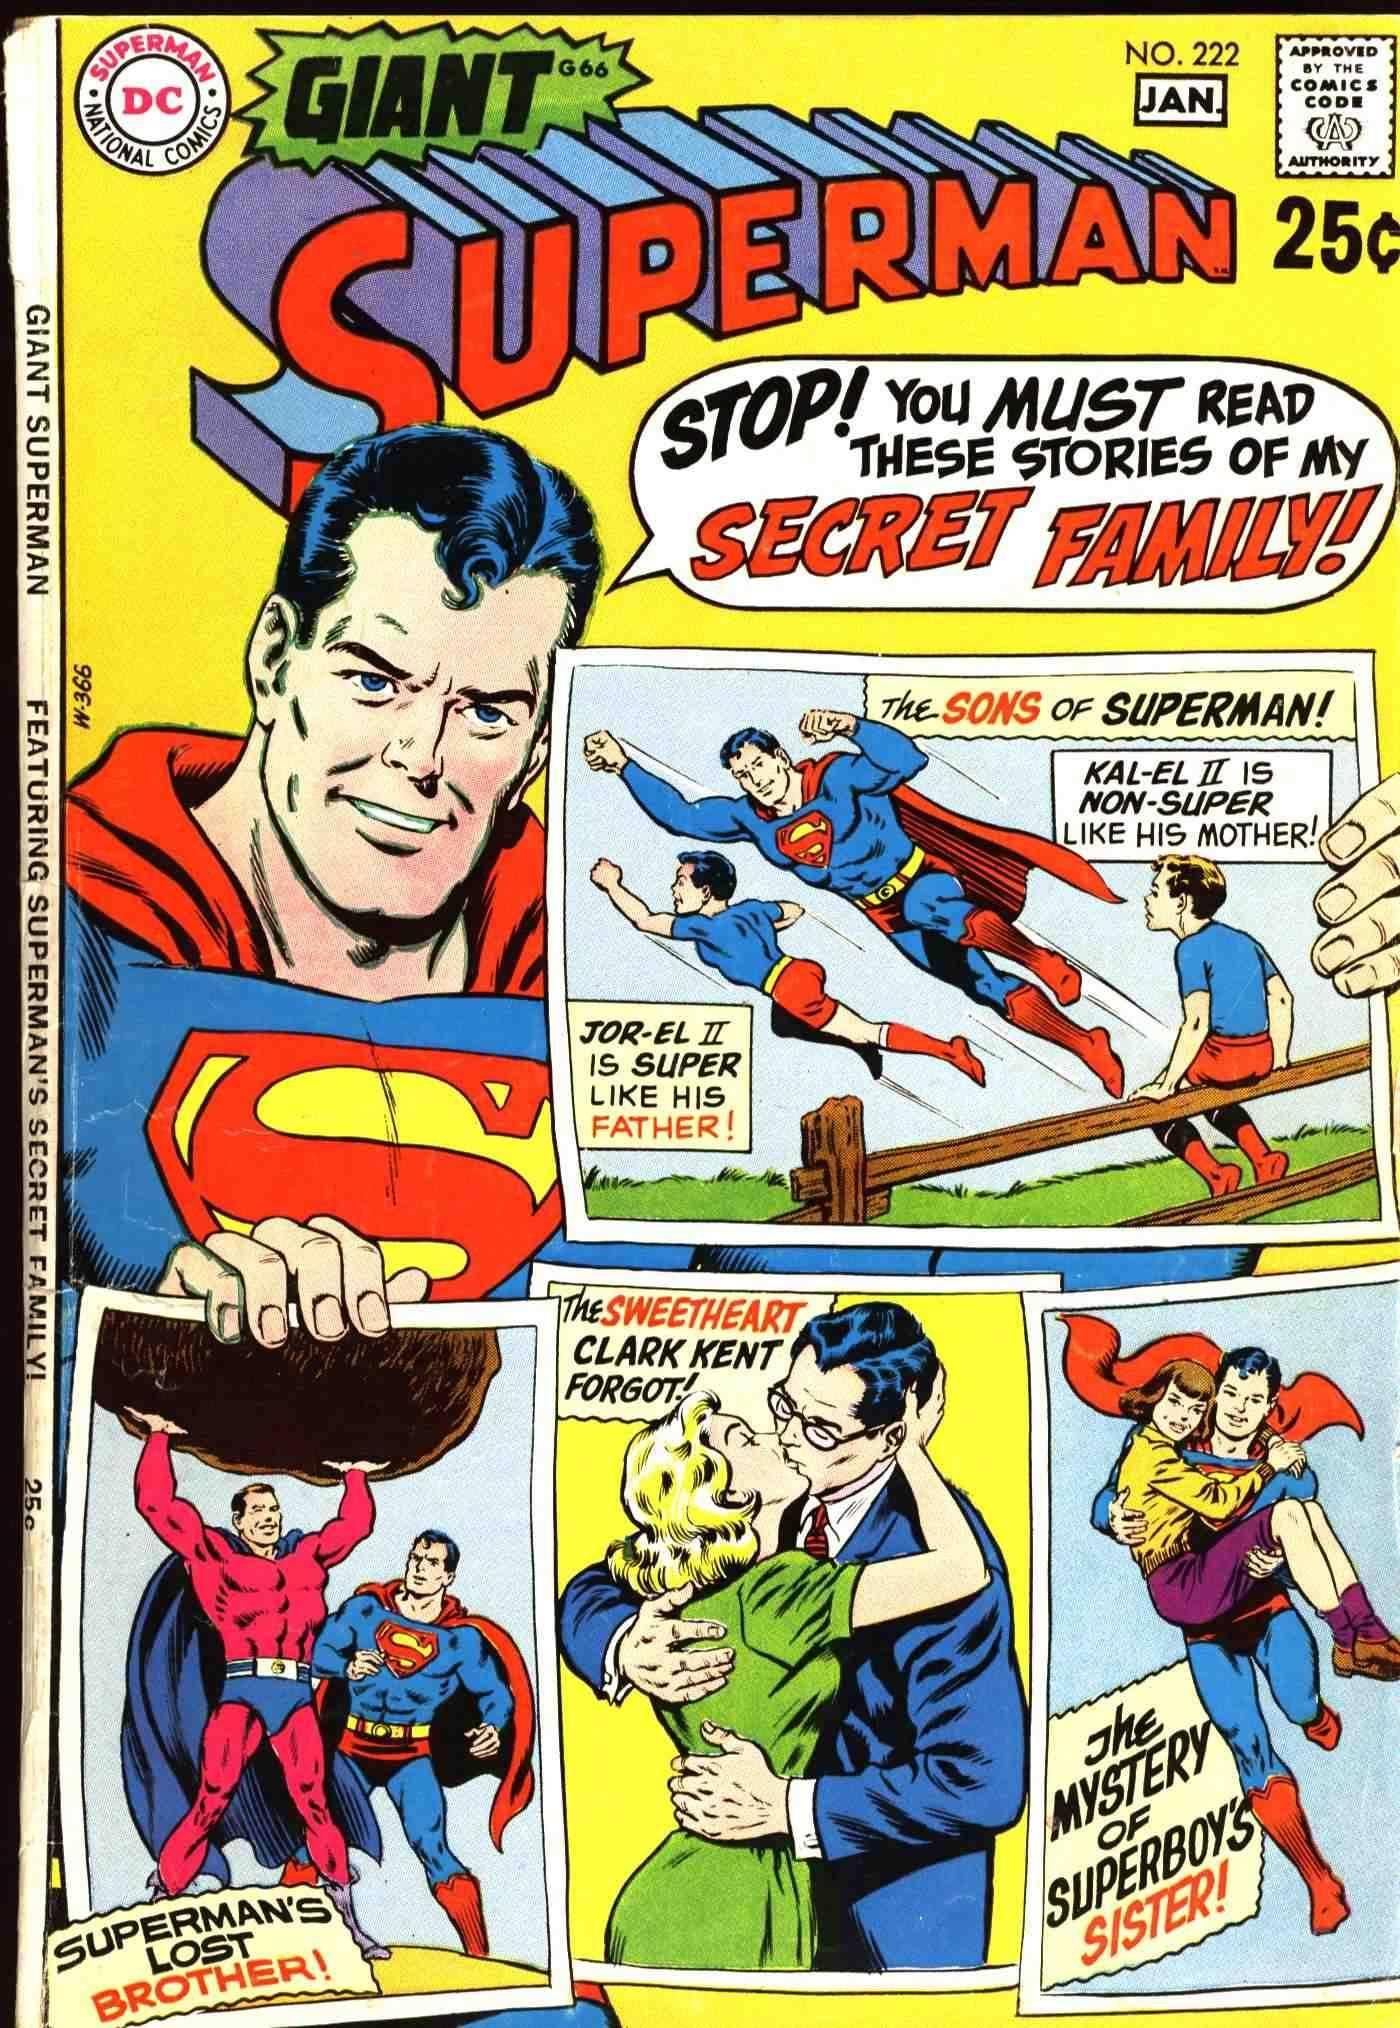 DC Giant 066 - Superman